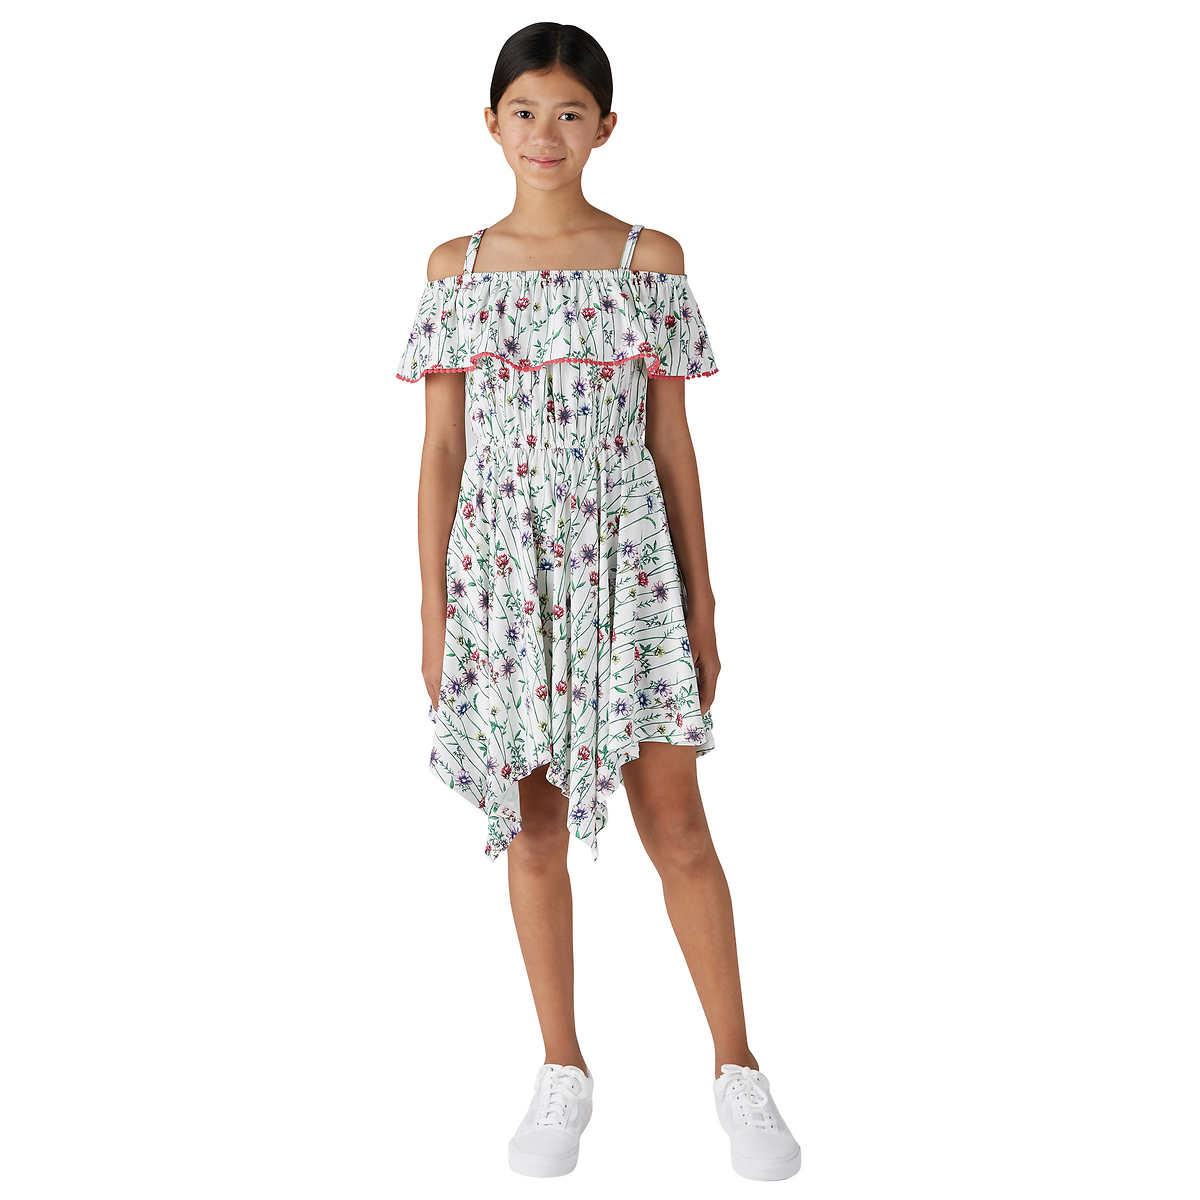 BCBG Girls Dresses From Costco $5-$6